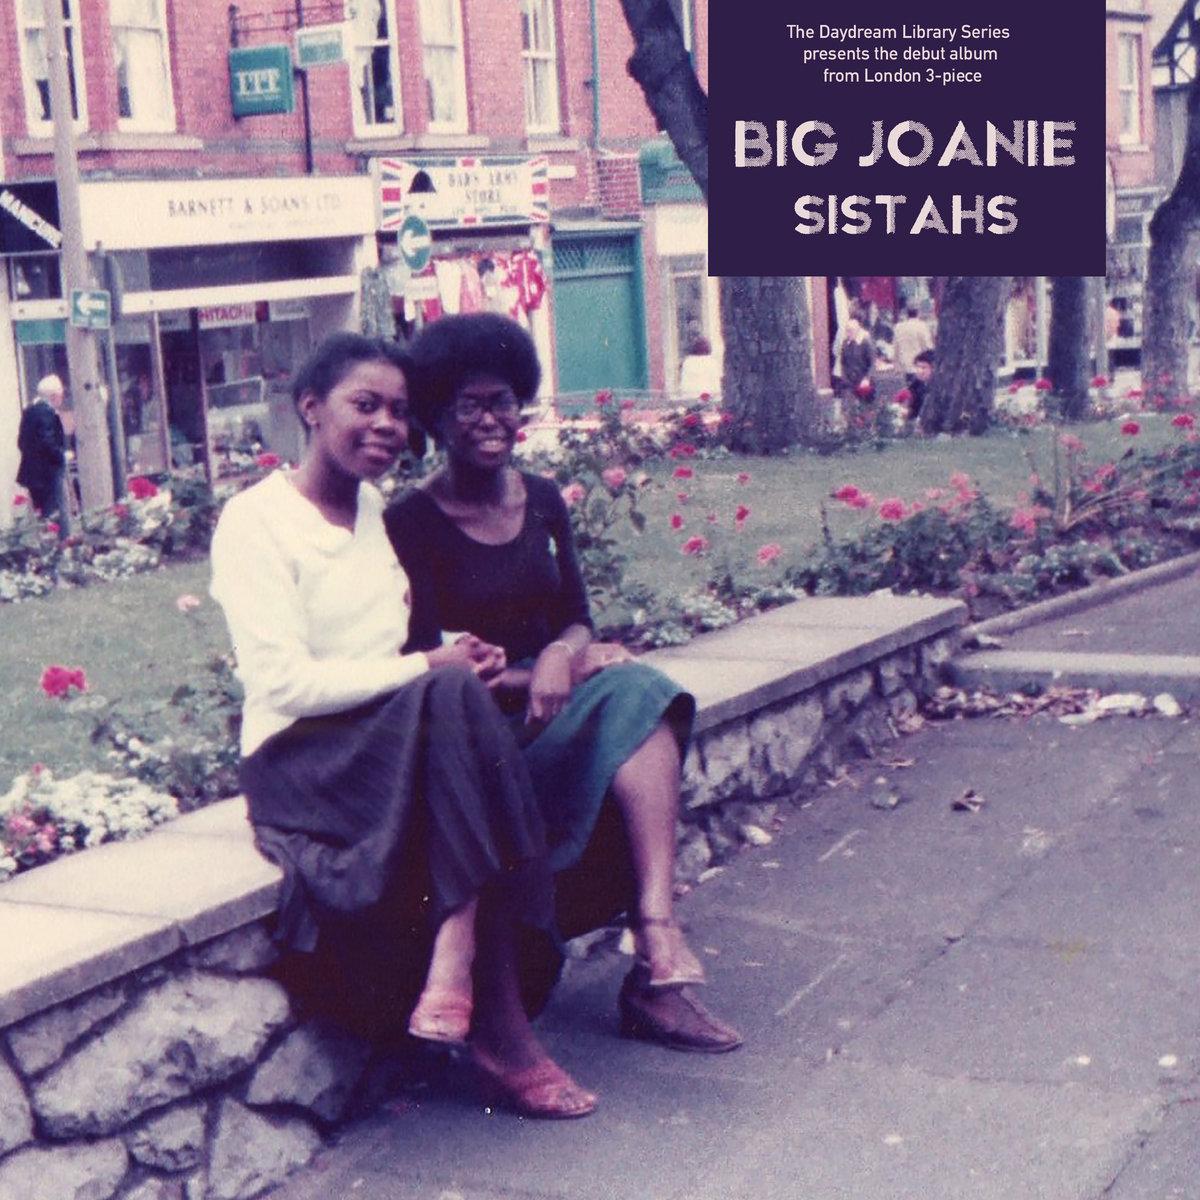 28. Big Joanie - Sistahs